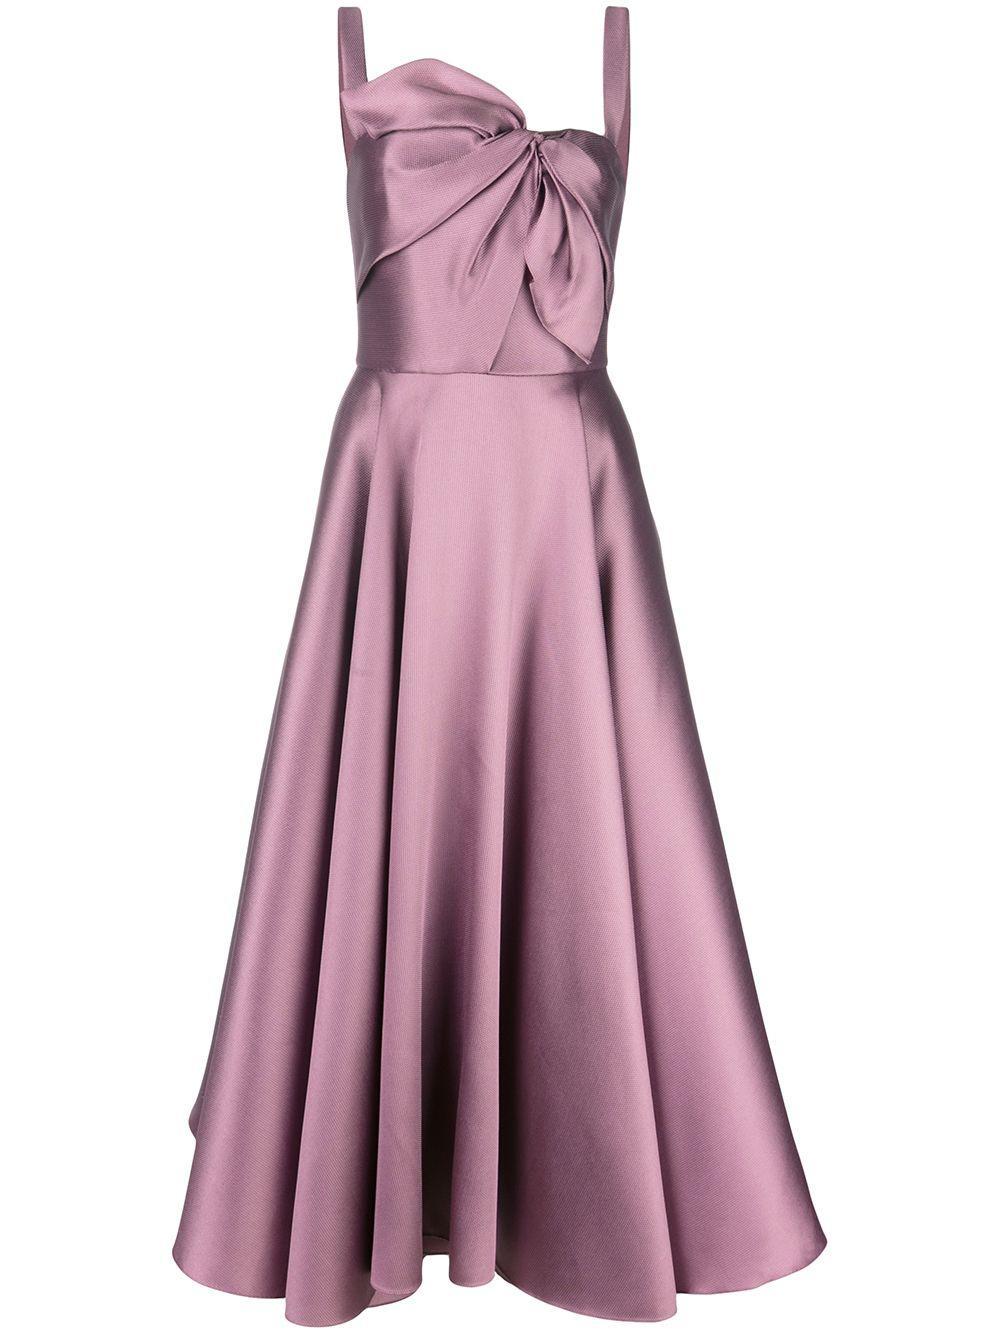 Sleeve Less Mikado Pique Tea Length Gown Item # N29G0875